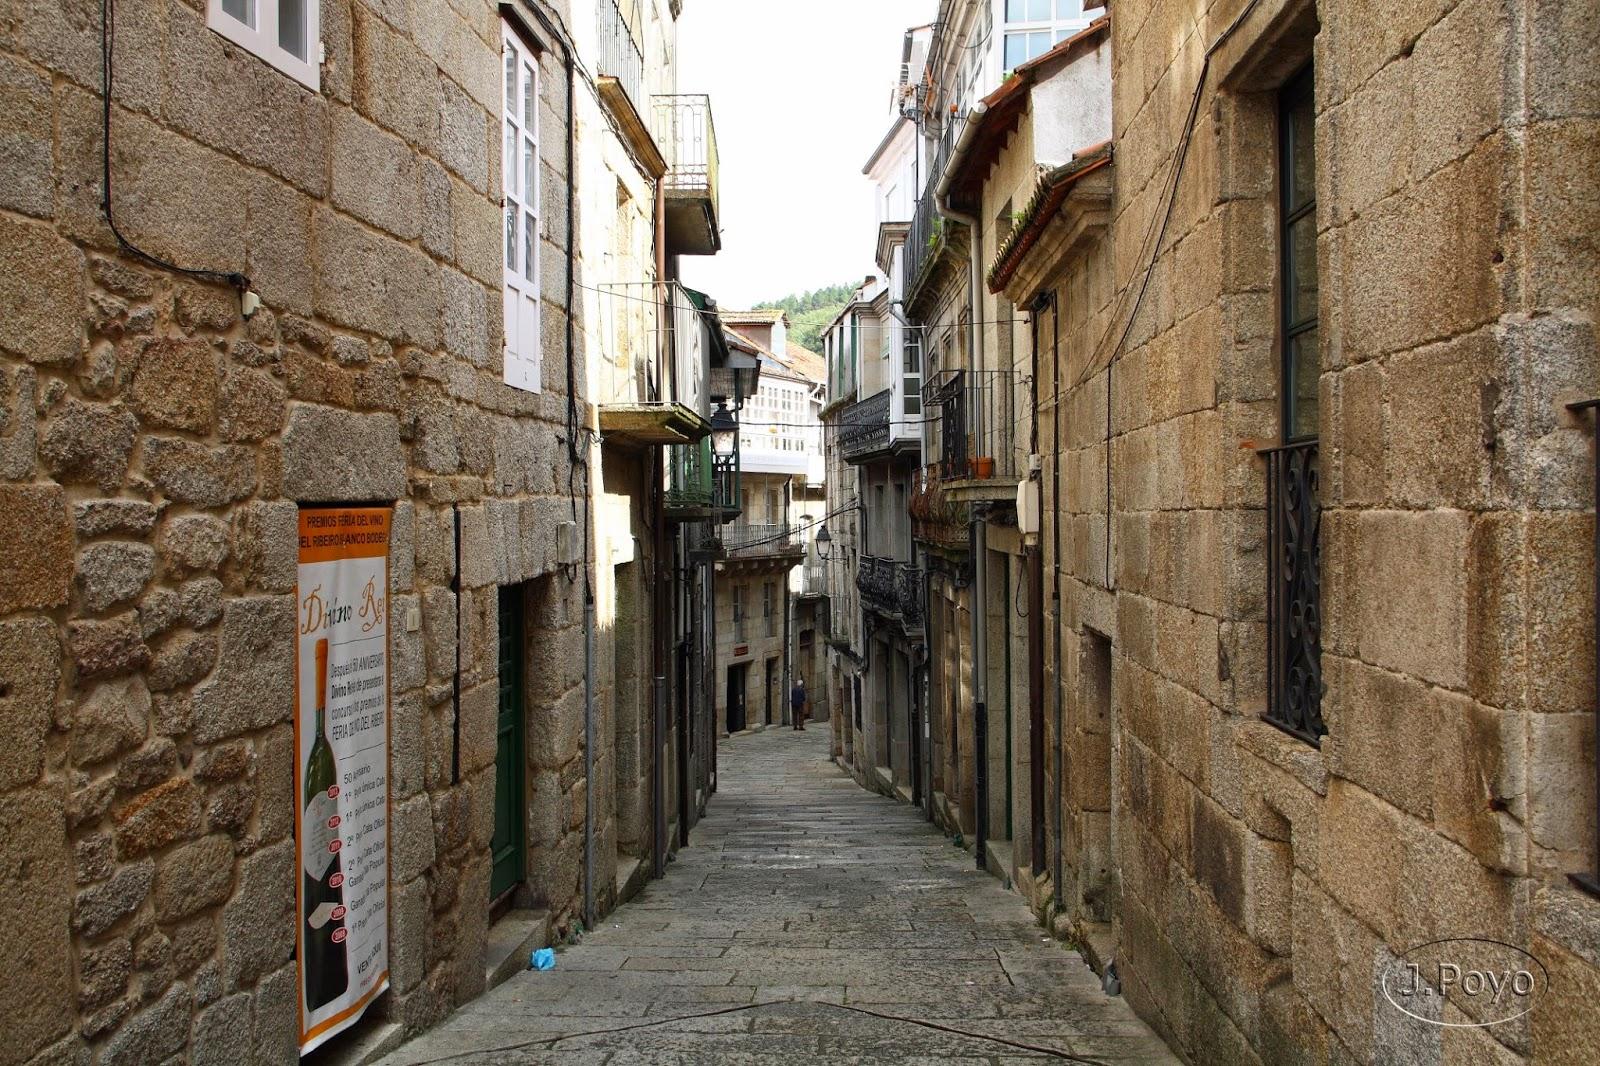 Callejuelas barrio judío de Ribadavia